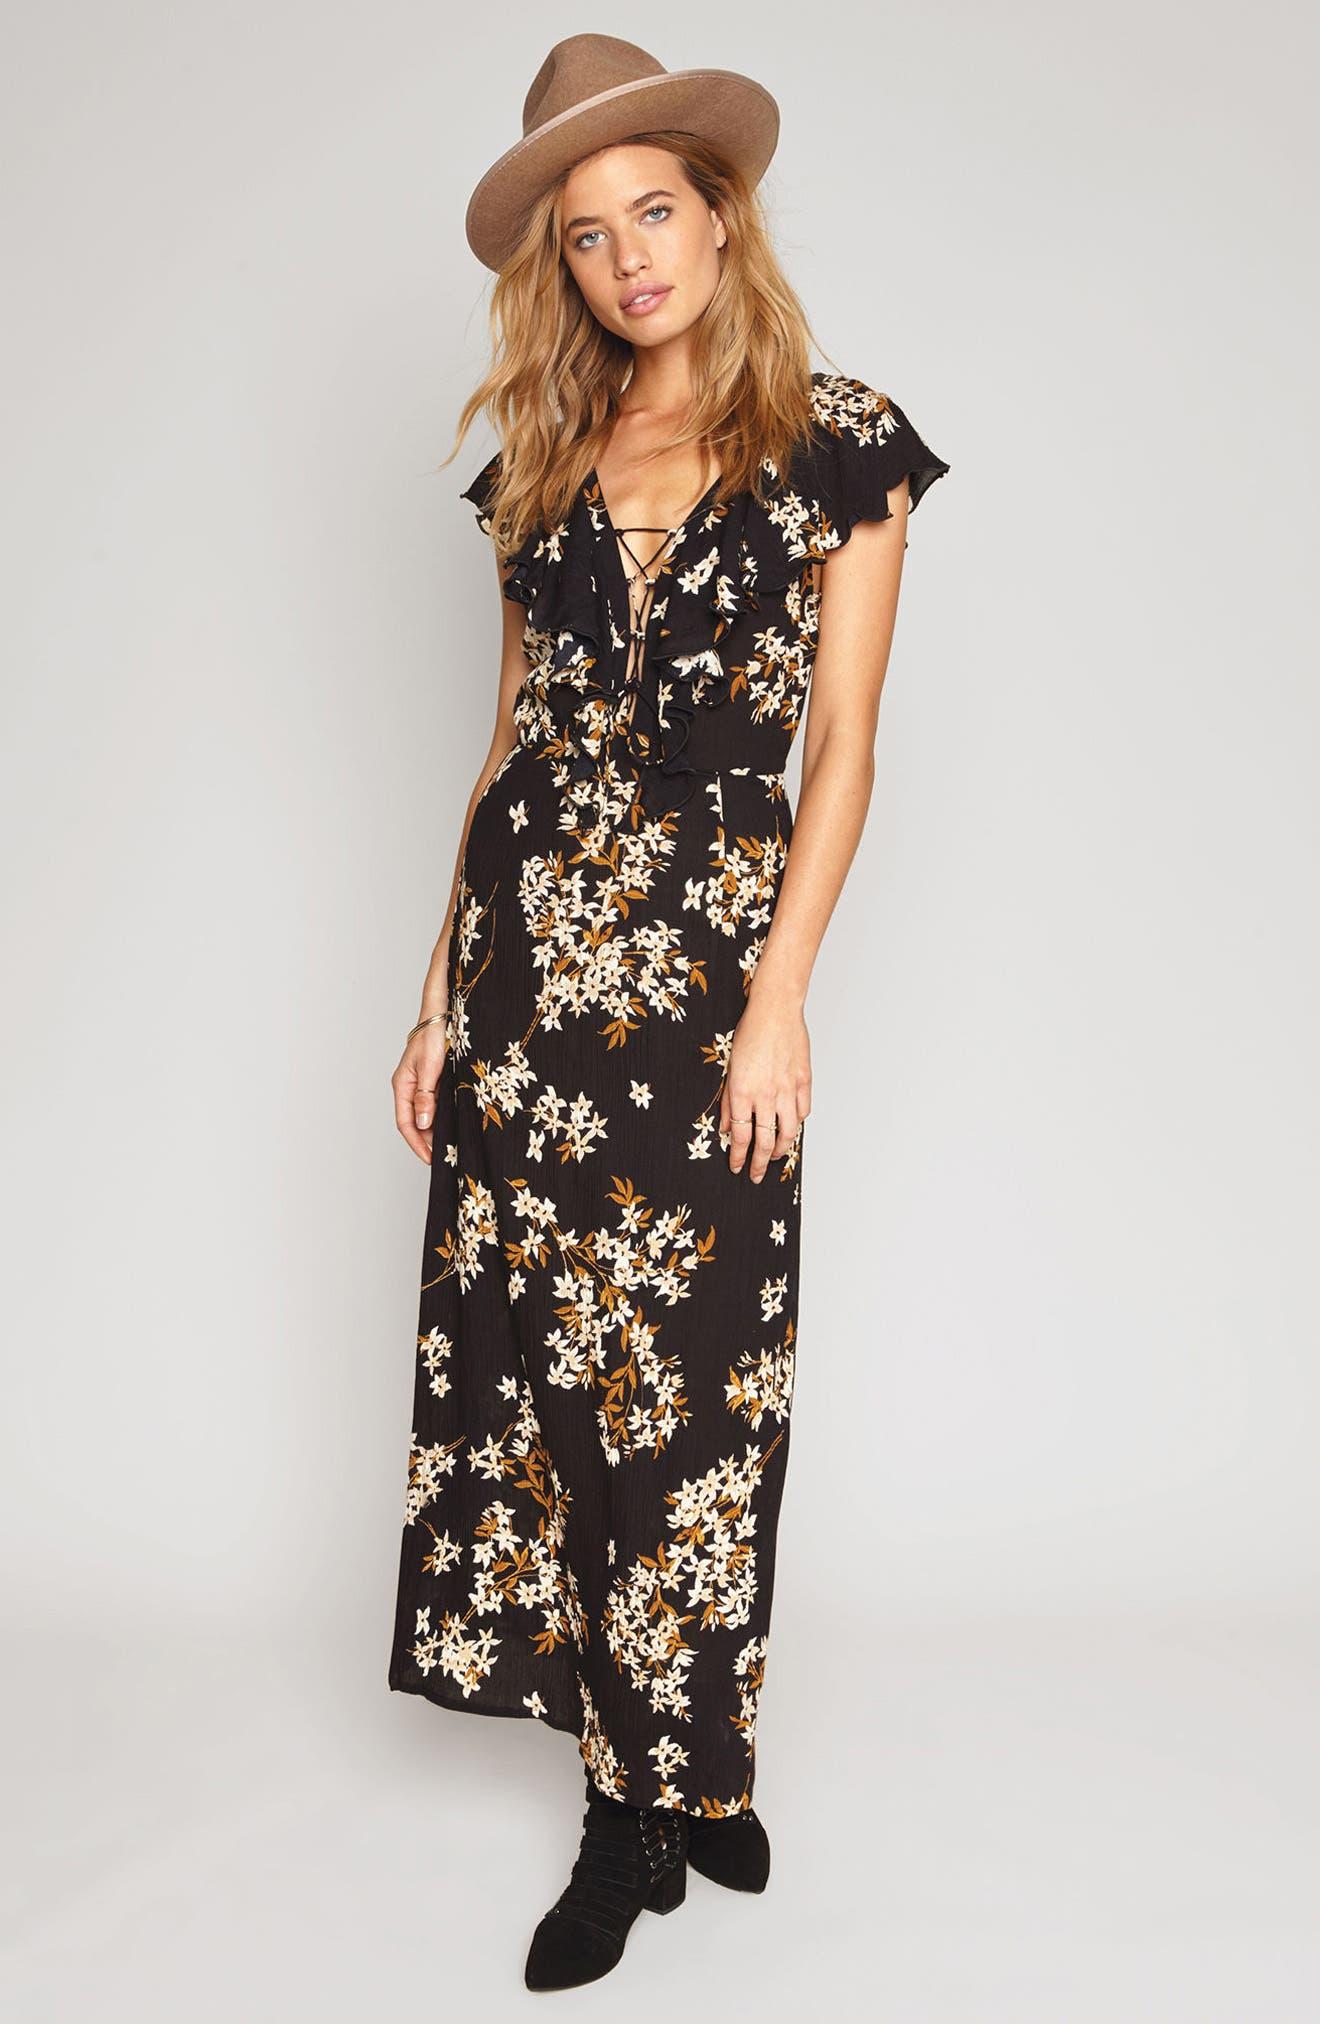 Alana Floral Lace-Up Dress,                             Alternate thumbnail 3, color,                             001